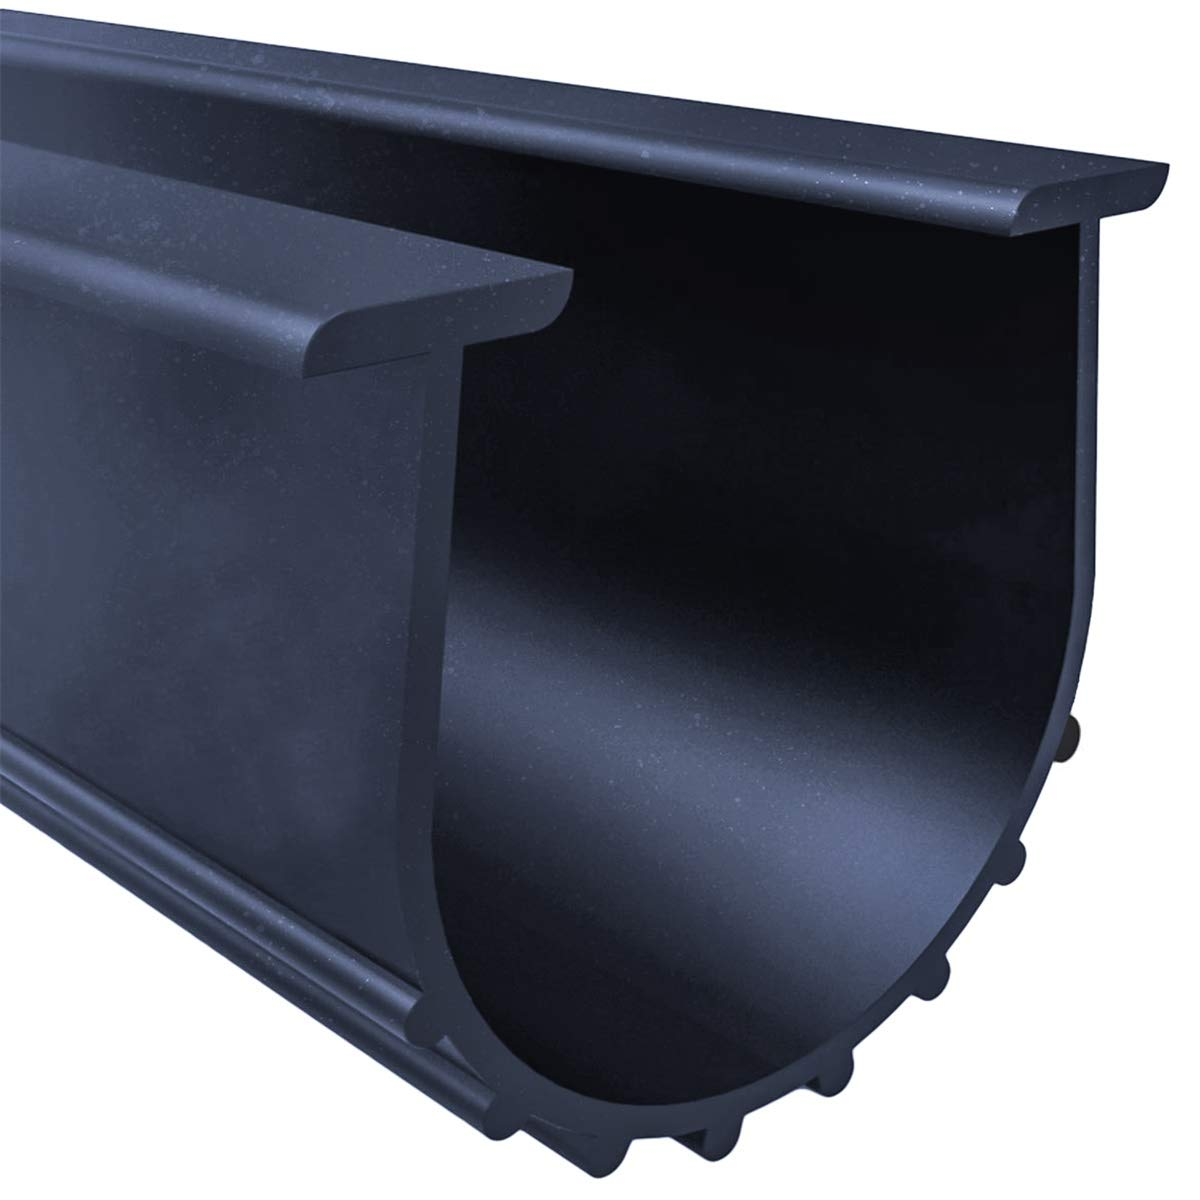 Garage Door Bottom Weather Stripping Kit Rubber Seal Strip Replacement, Weatherproofing Universal Sealing Professional Grade T Rubber,5/16'' T Ends, 3 3/4'' Width X 20 Feet Lenth (Black)